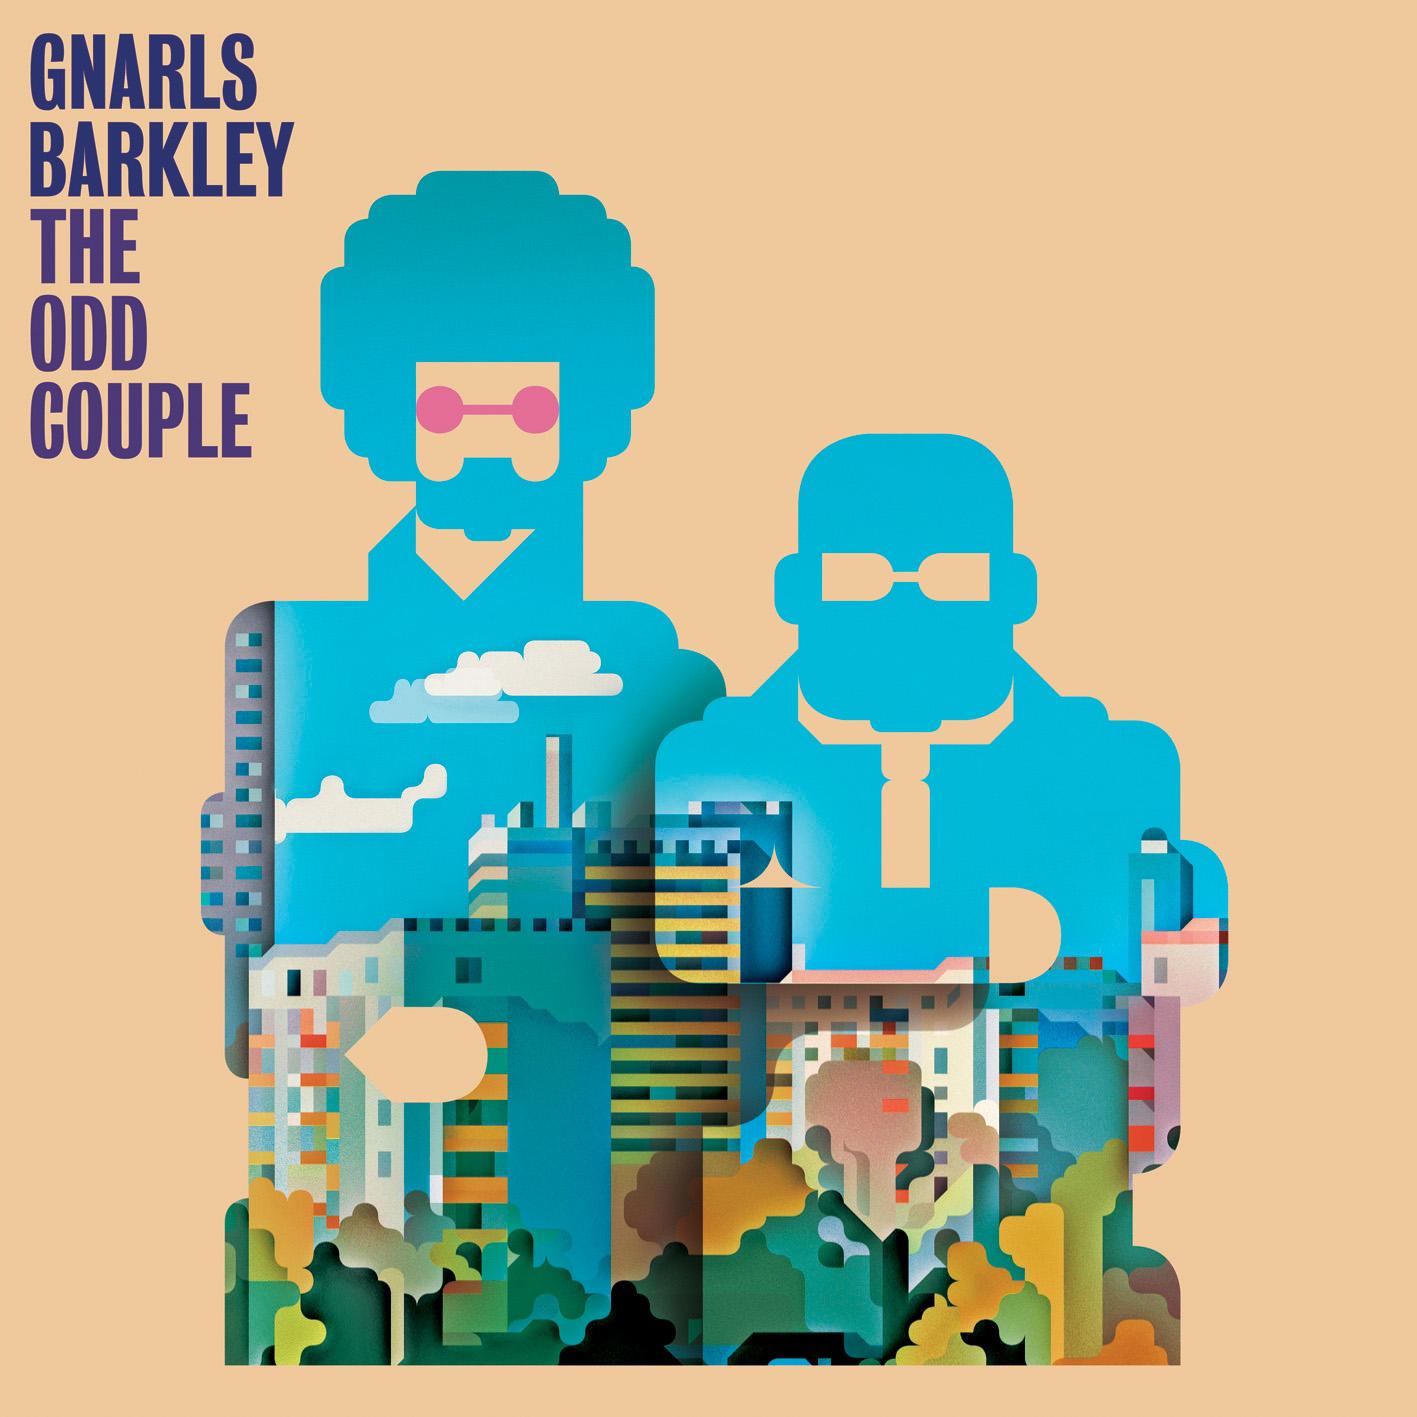 Gnarls-Barkley-The-Odd-Couple